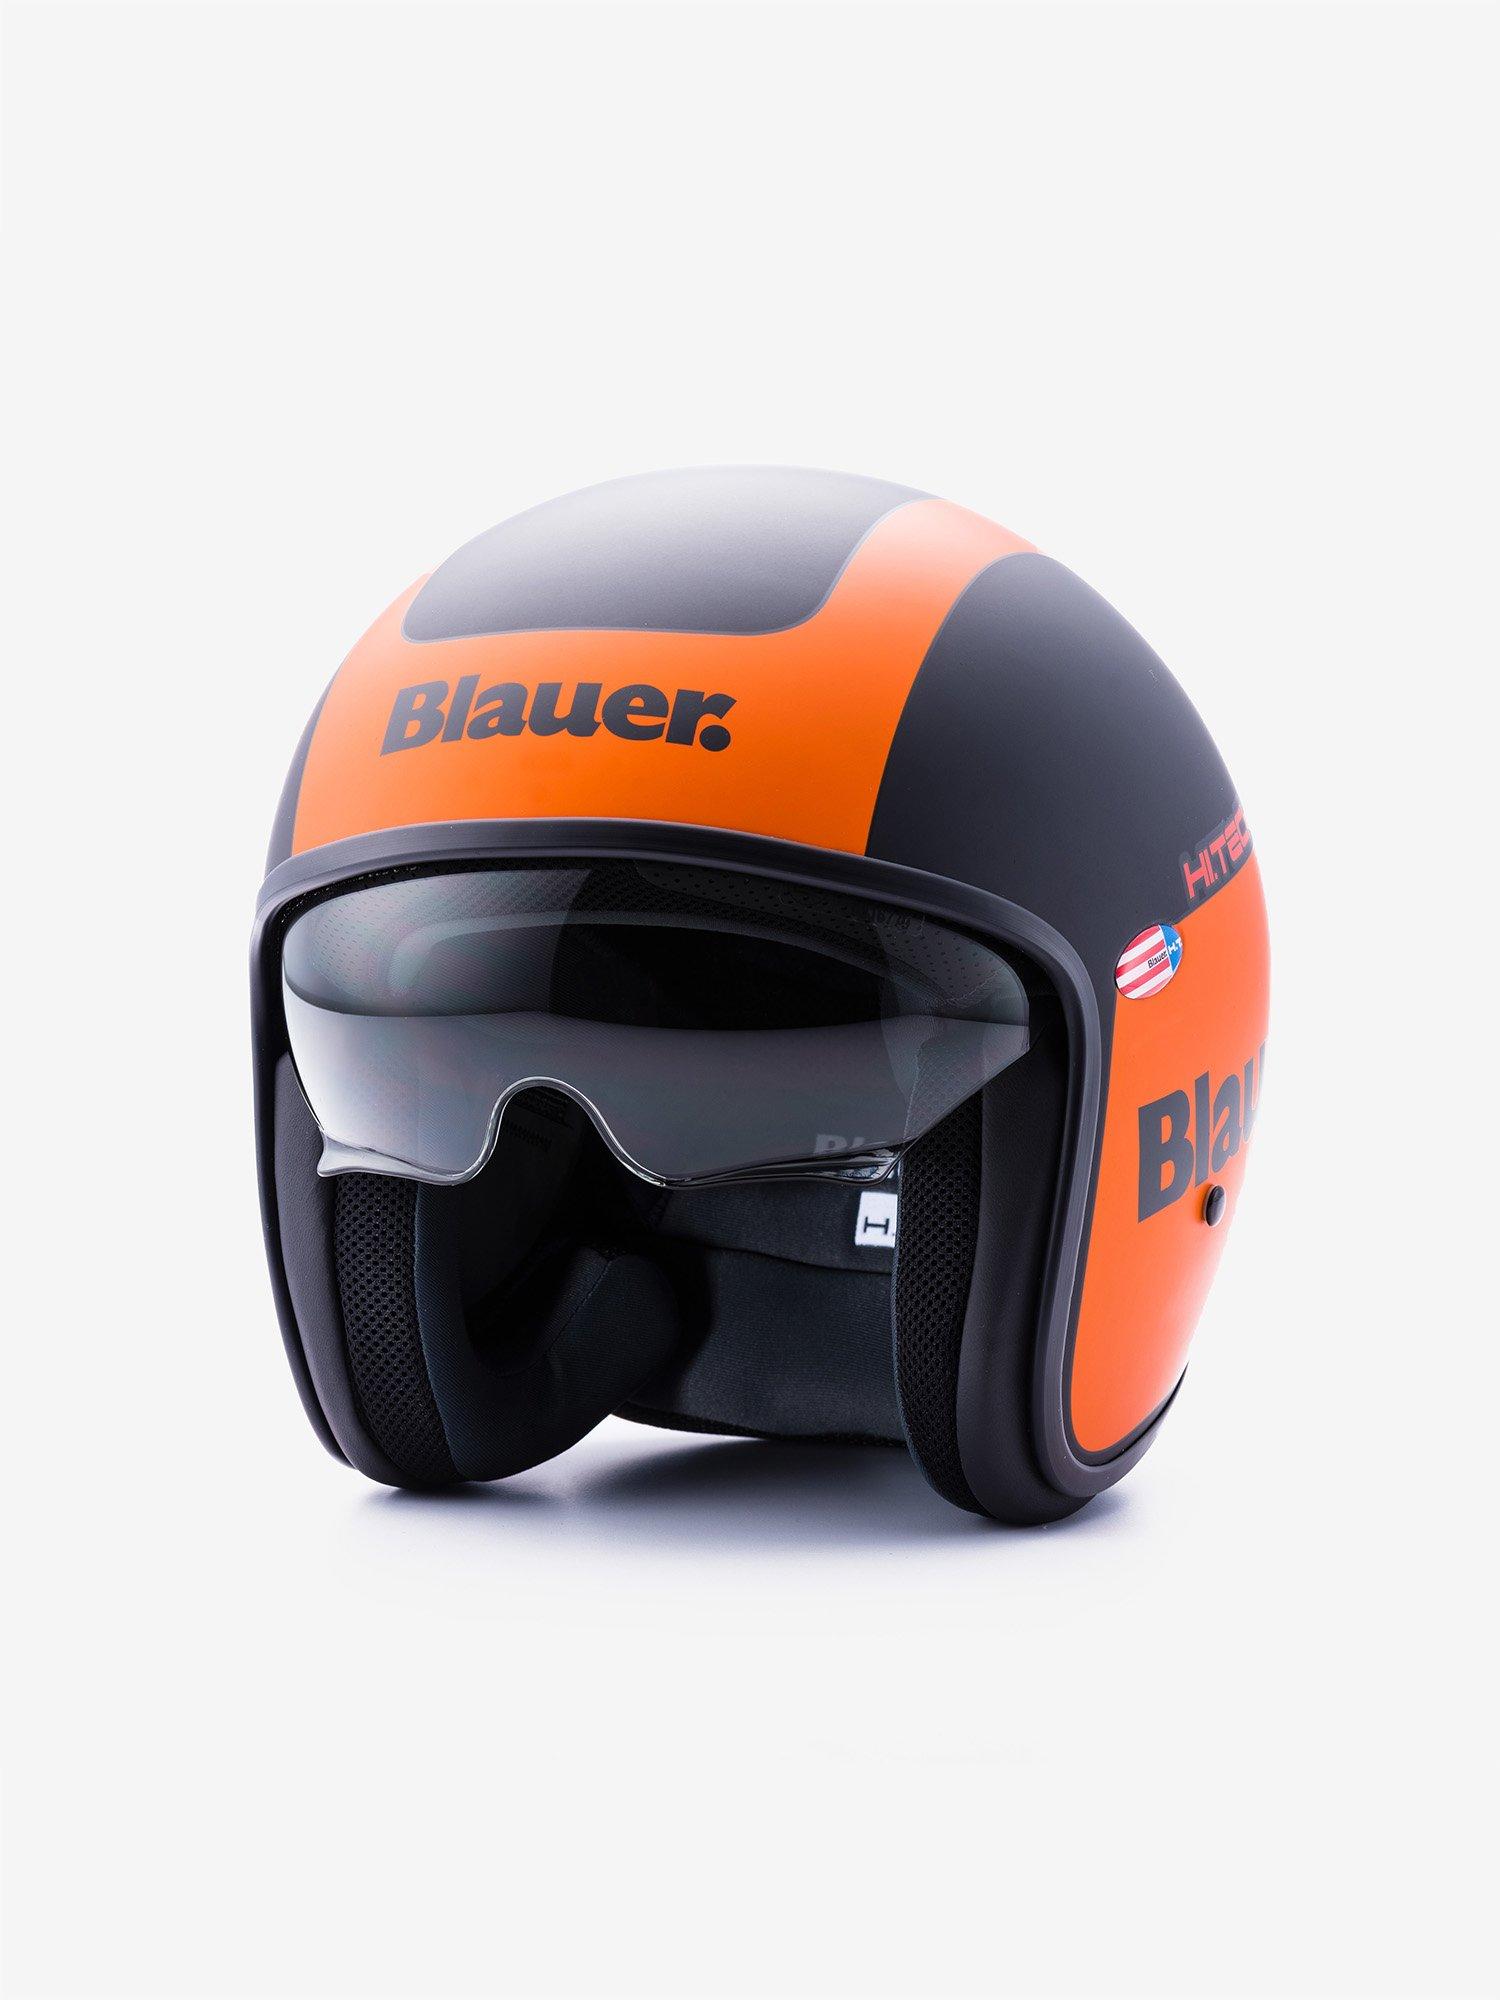 Blauer - PILOT 1.1 BICOLOR MATT - Black / Orange Matt - Blauer